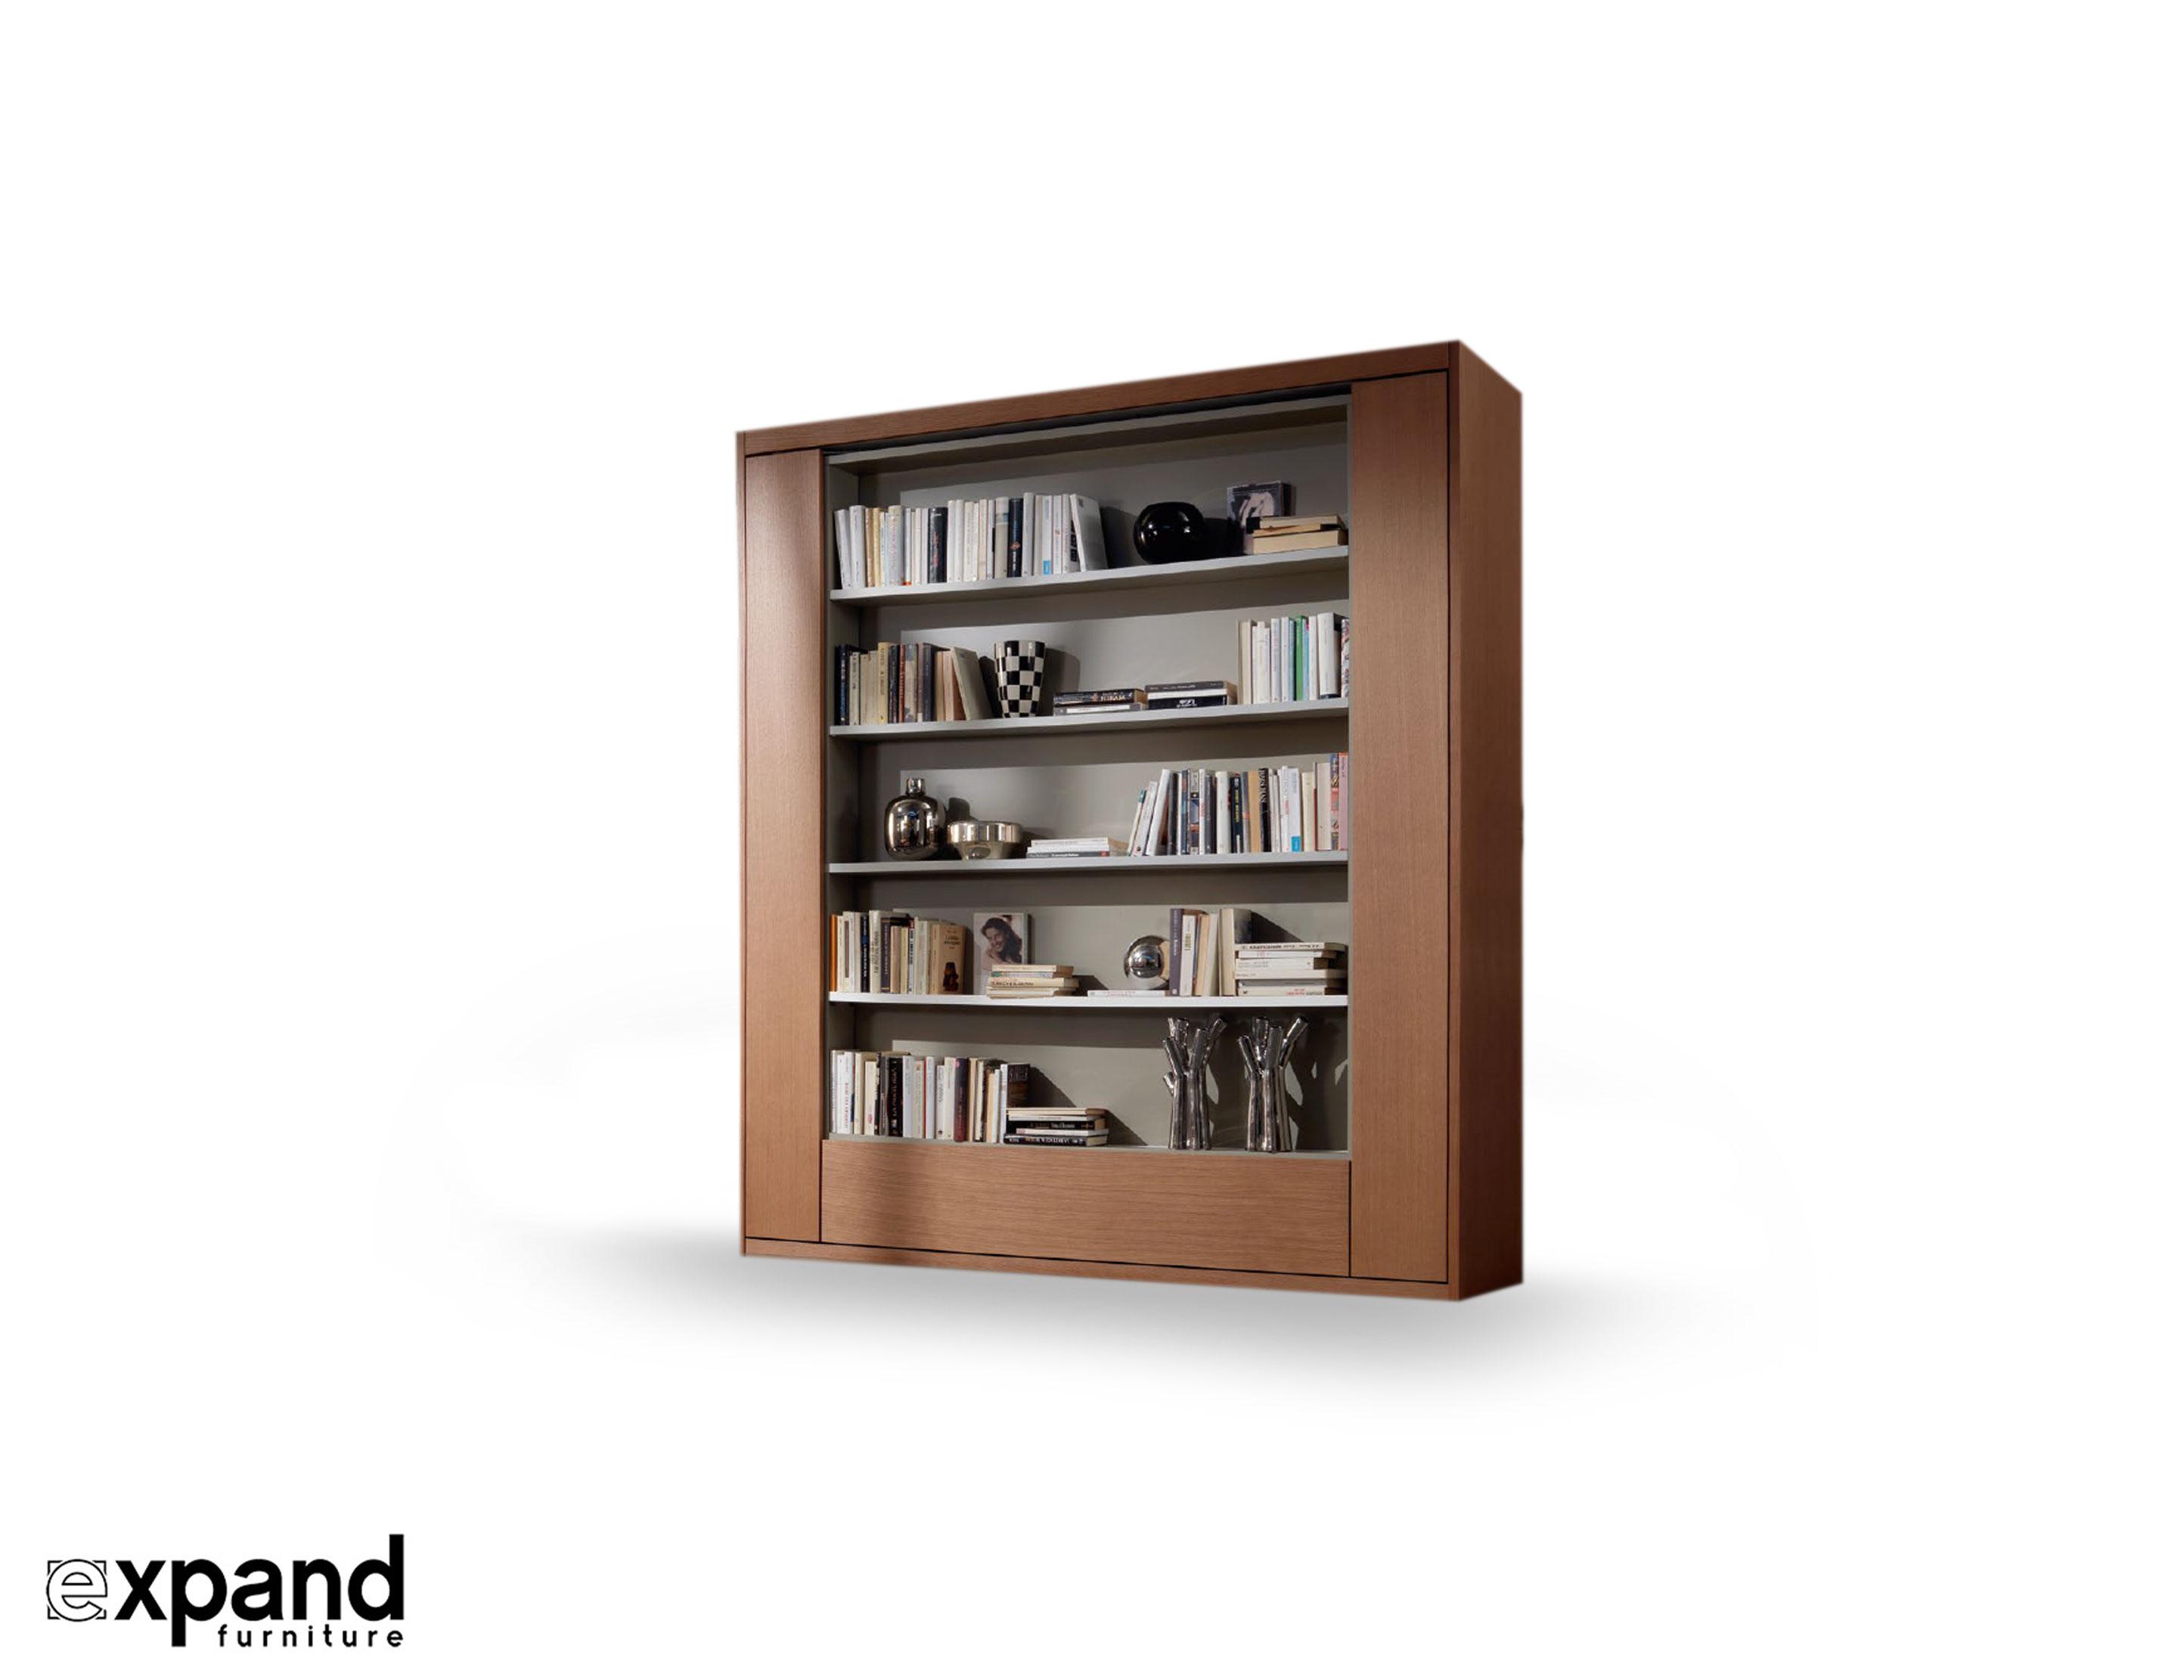 round bookcase market world trinahd me bookshelves rotating